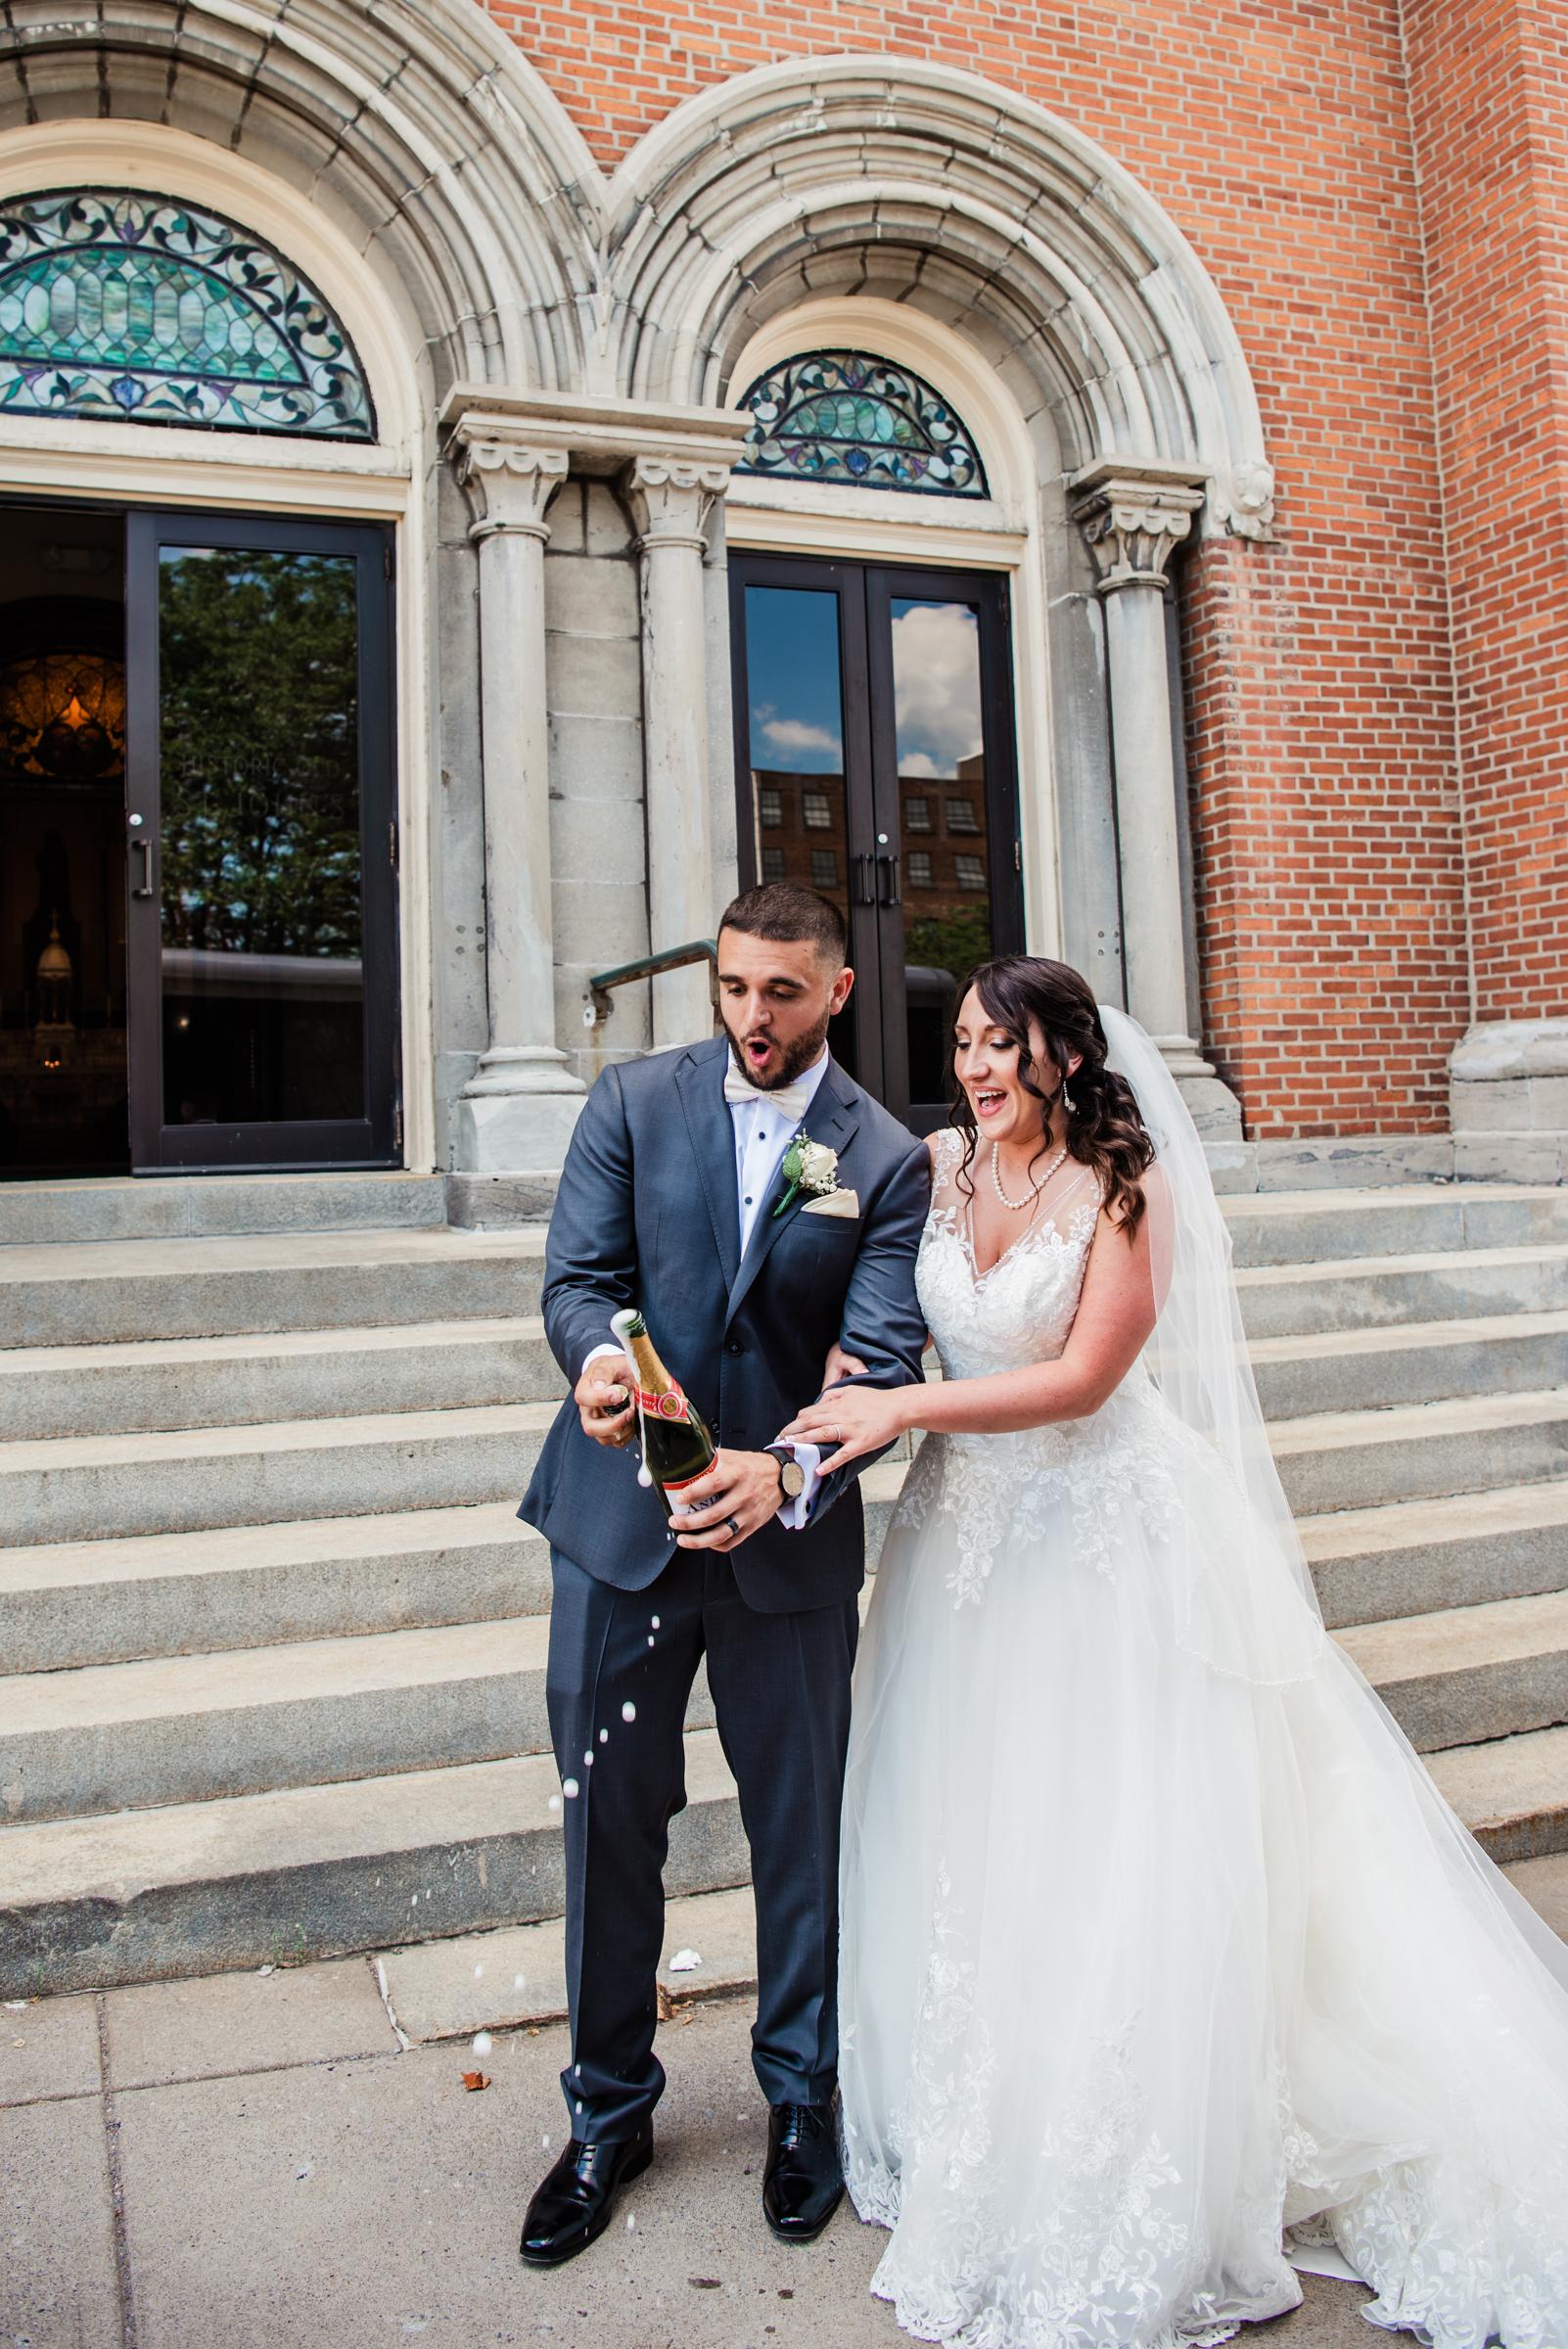 Historic_Old_St_Johns_Church_Valentinos_Banquet_Hall_Central_NY_Wedding_JILL_STUDIO_Rochester_NY_Photographer_DSC_5998.jpg